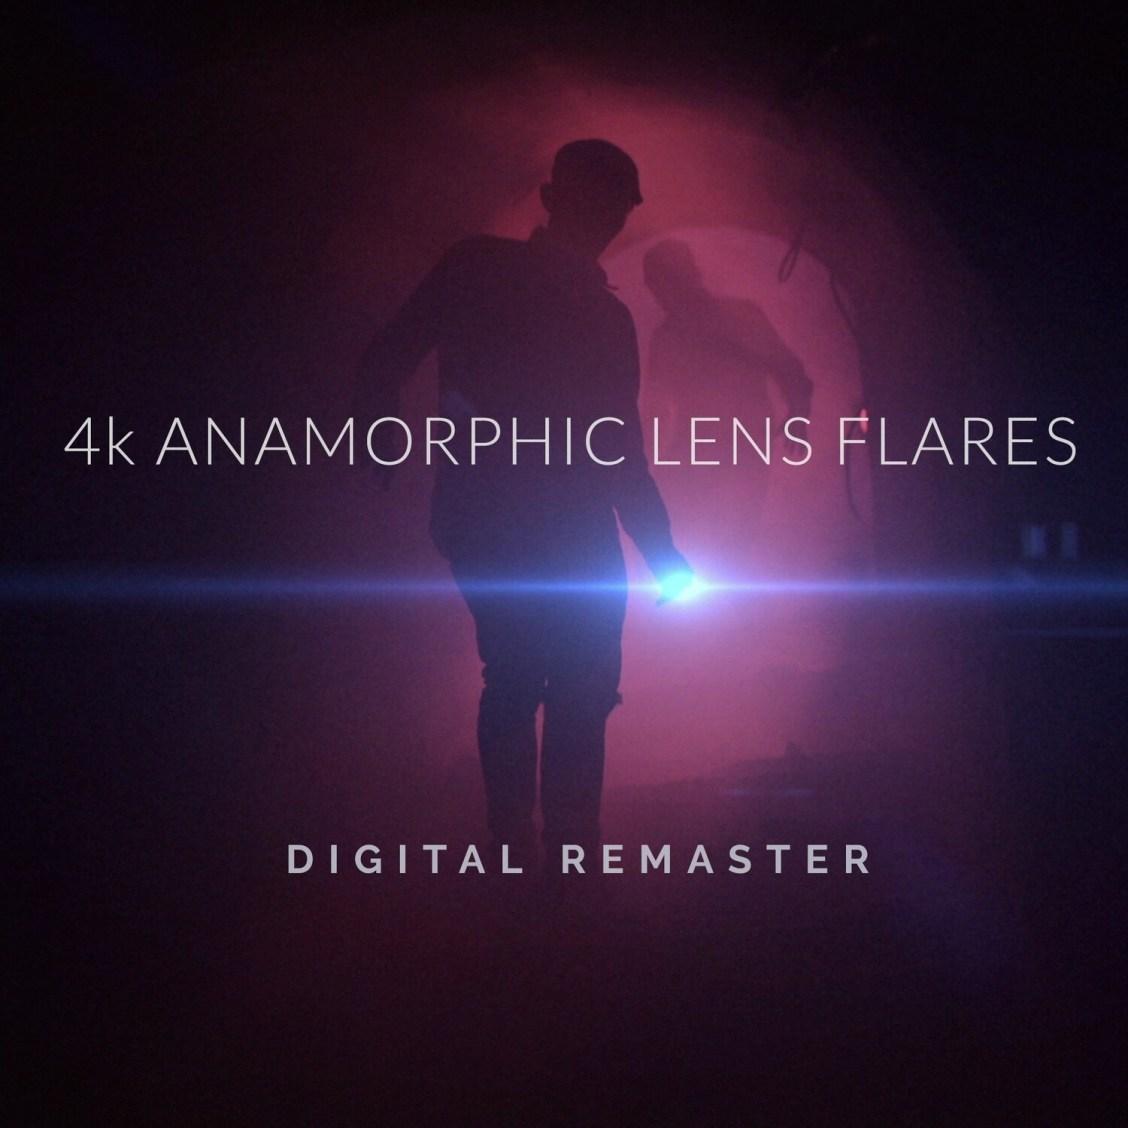 Free Colorist Factory Digital Remaster 4K Anamorphic Lens Flares